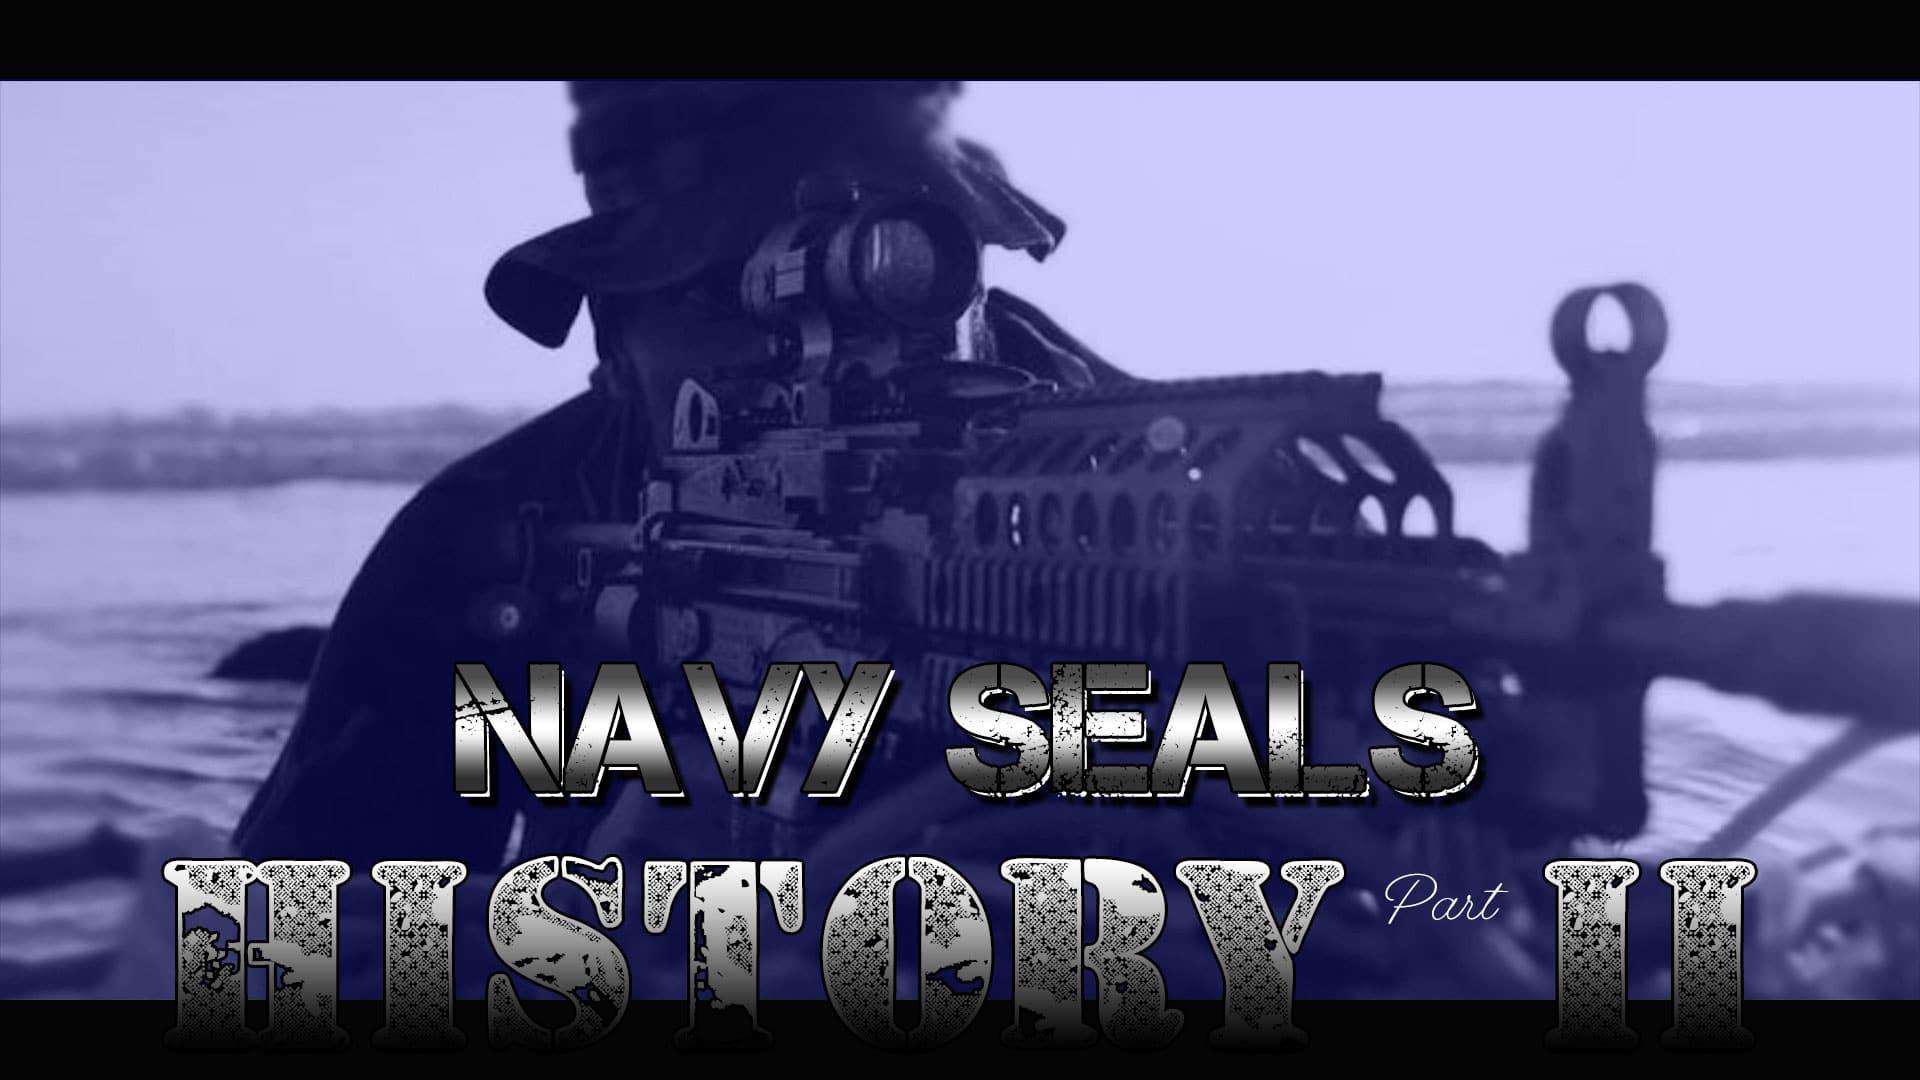 U.S. Navy Seals History - Part Two